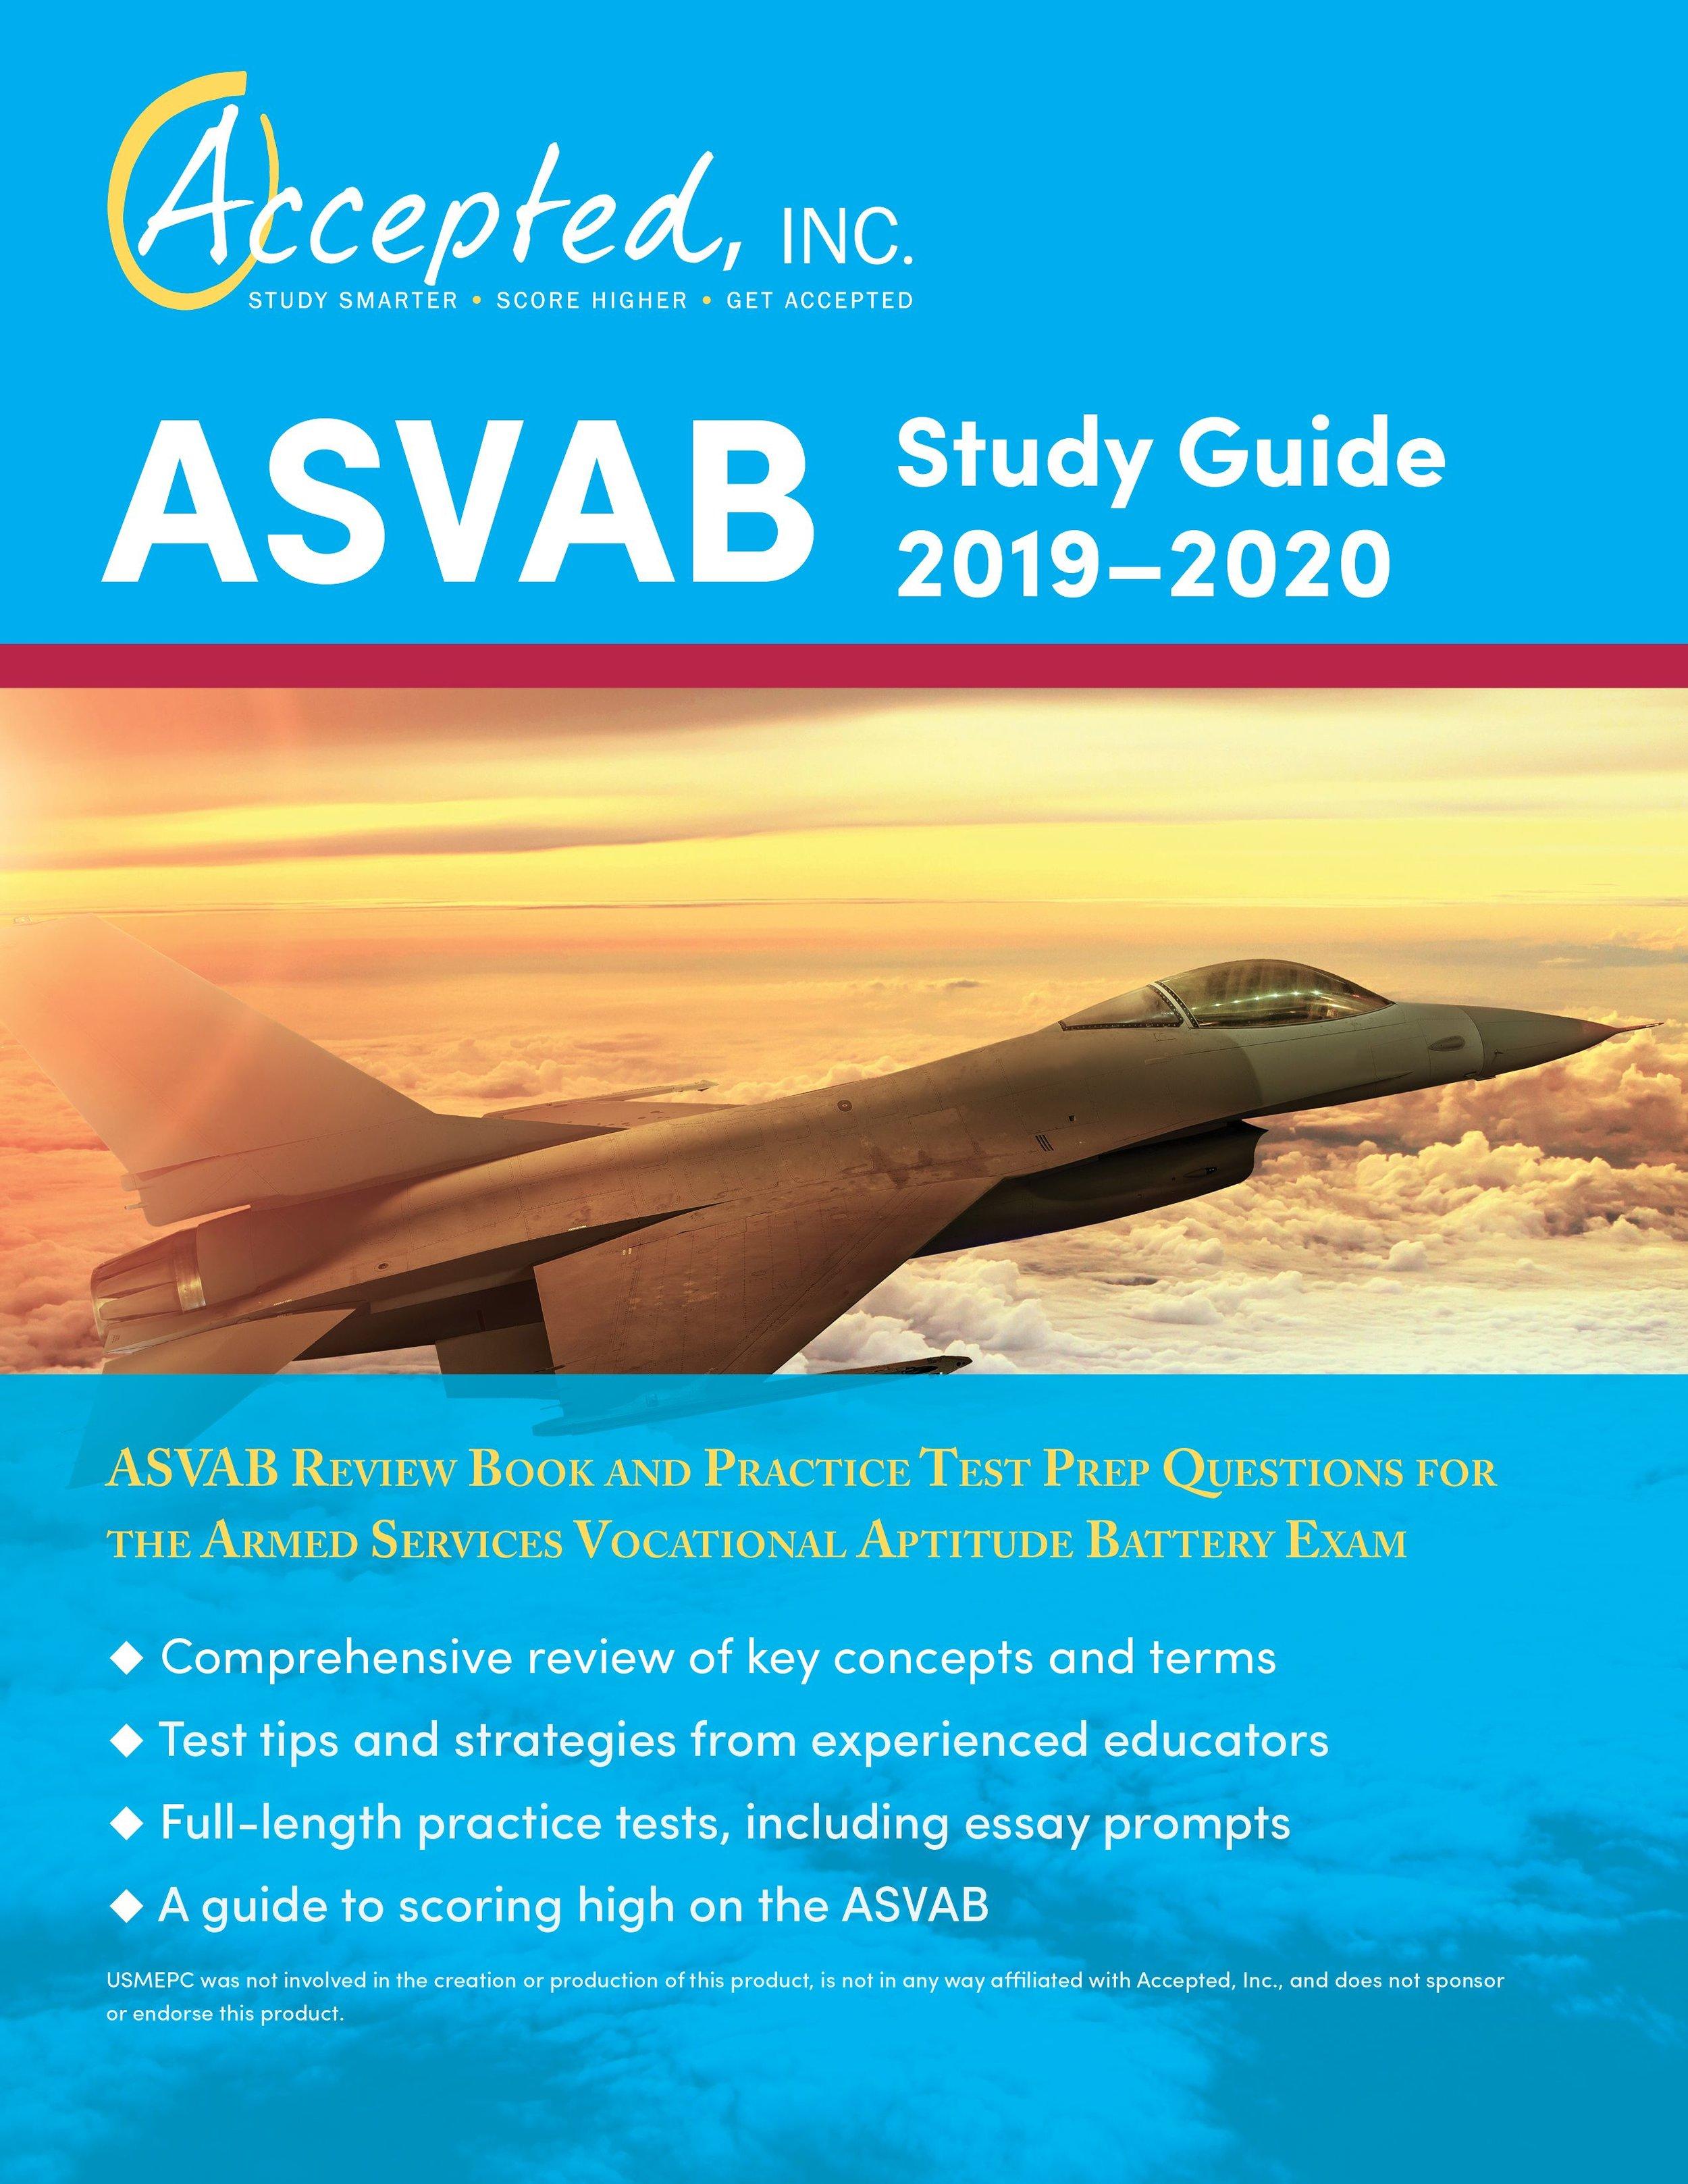 ASVAB Study Guide 2019 – 2020